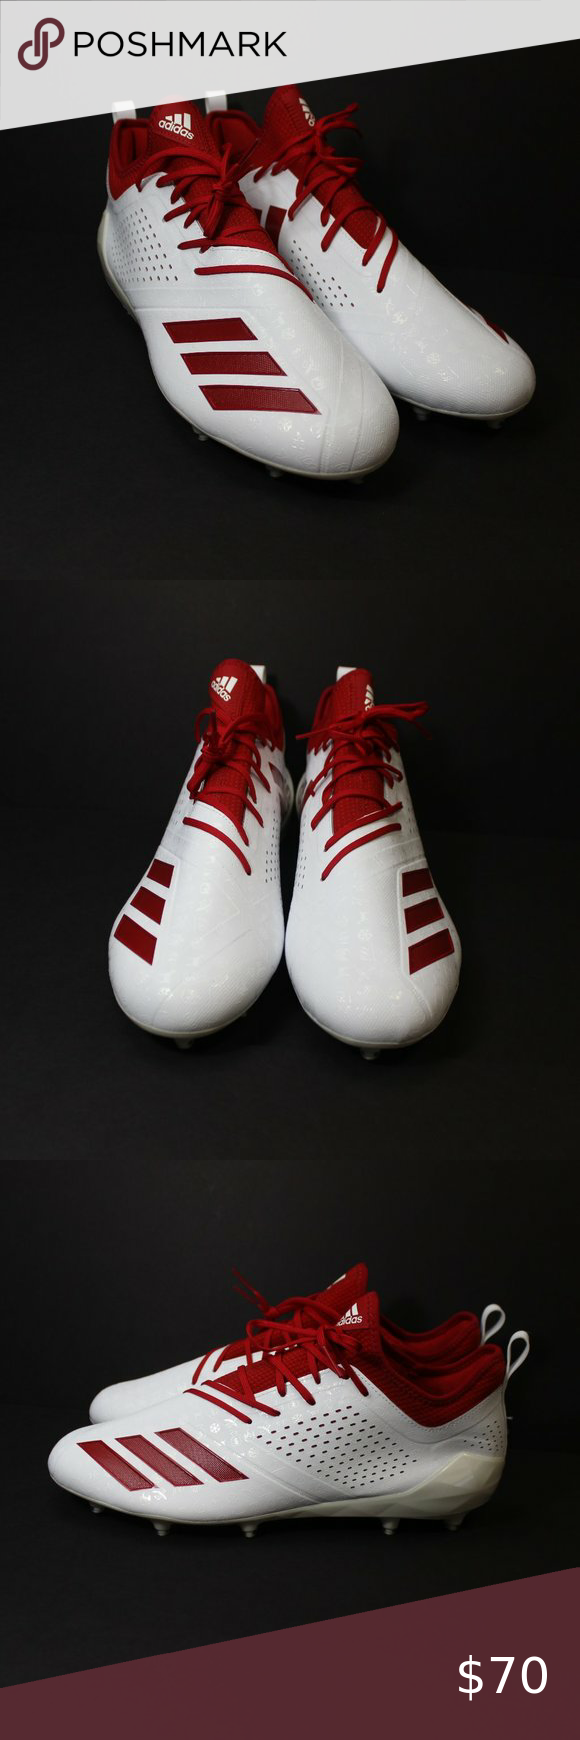 Adidas Adizero 5 Star 7 0 Emoji Football Cleats In 2020 Red Adidas Football Cleats Adidas Men